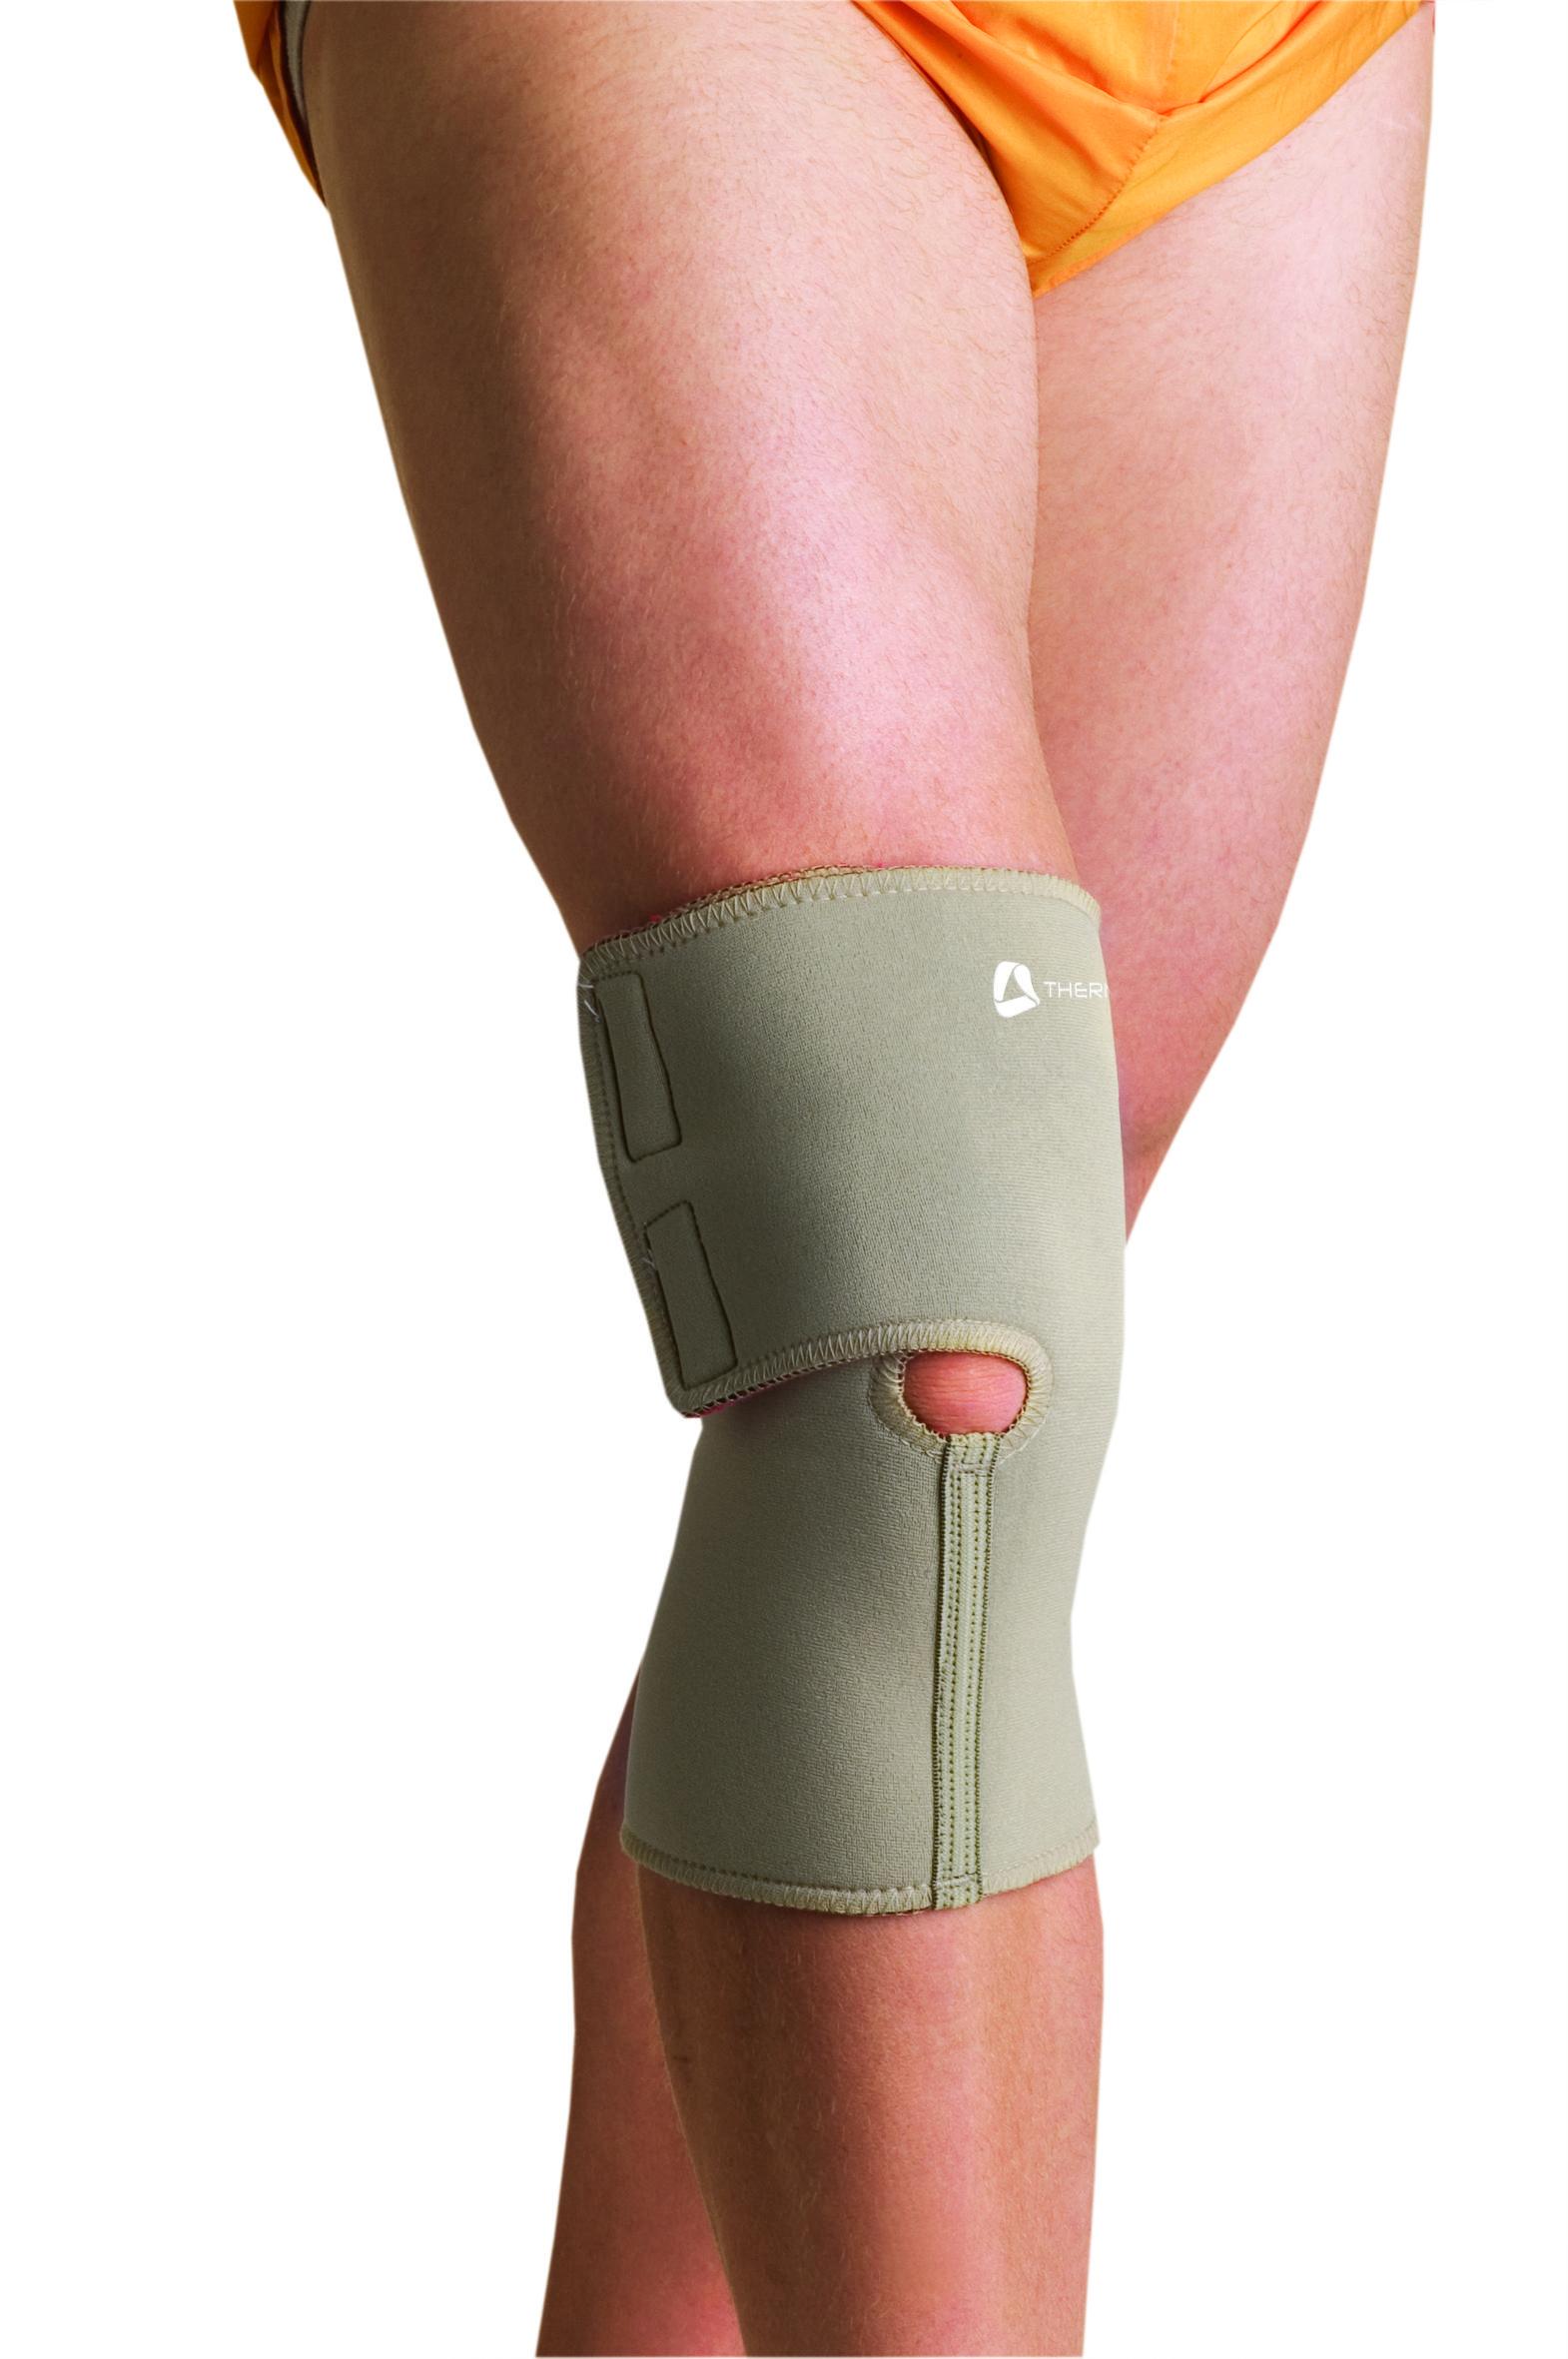 Thermoskin Arthritic Kneewrap Right